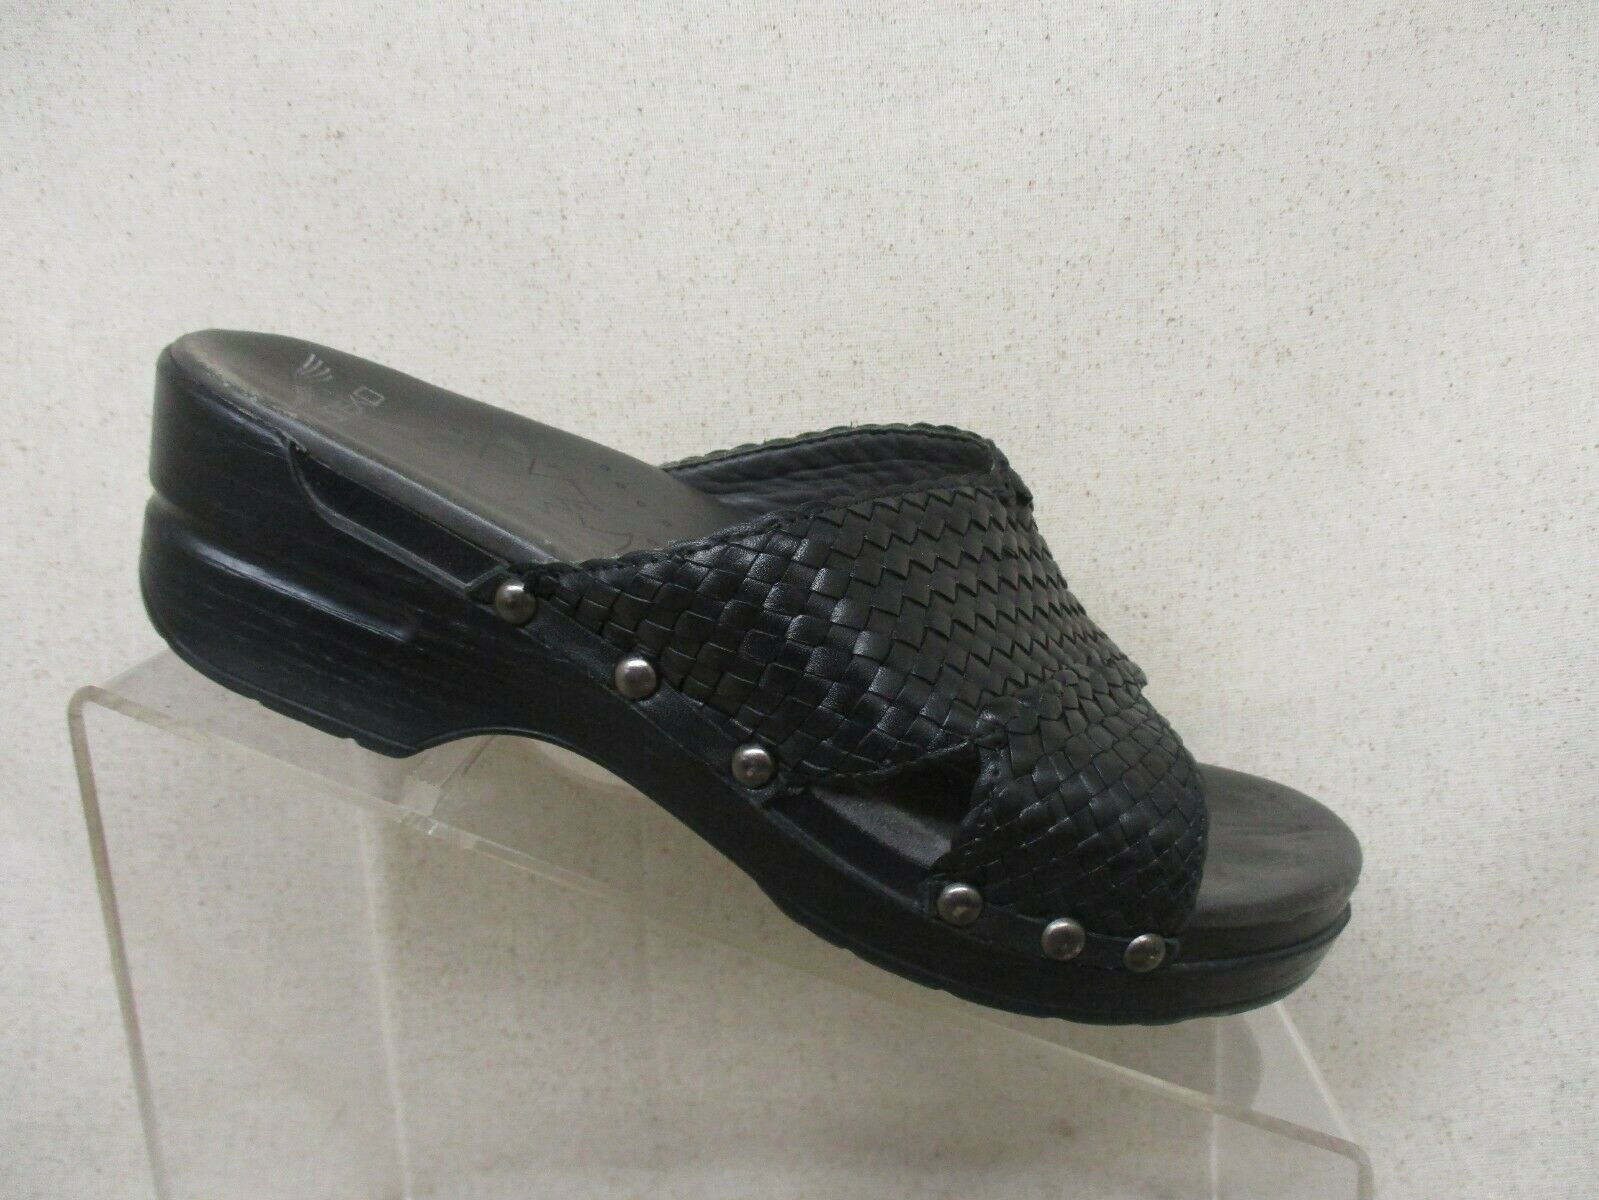 Dansko Cuir noir Weave Confort Sabots Sandales chaussures Taille 38 eur